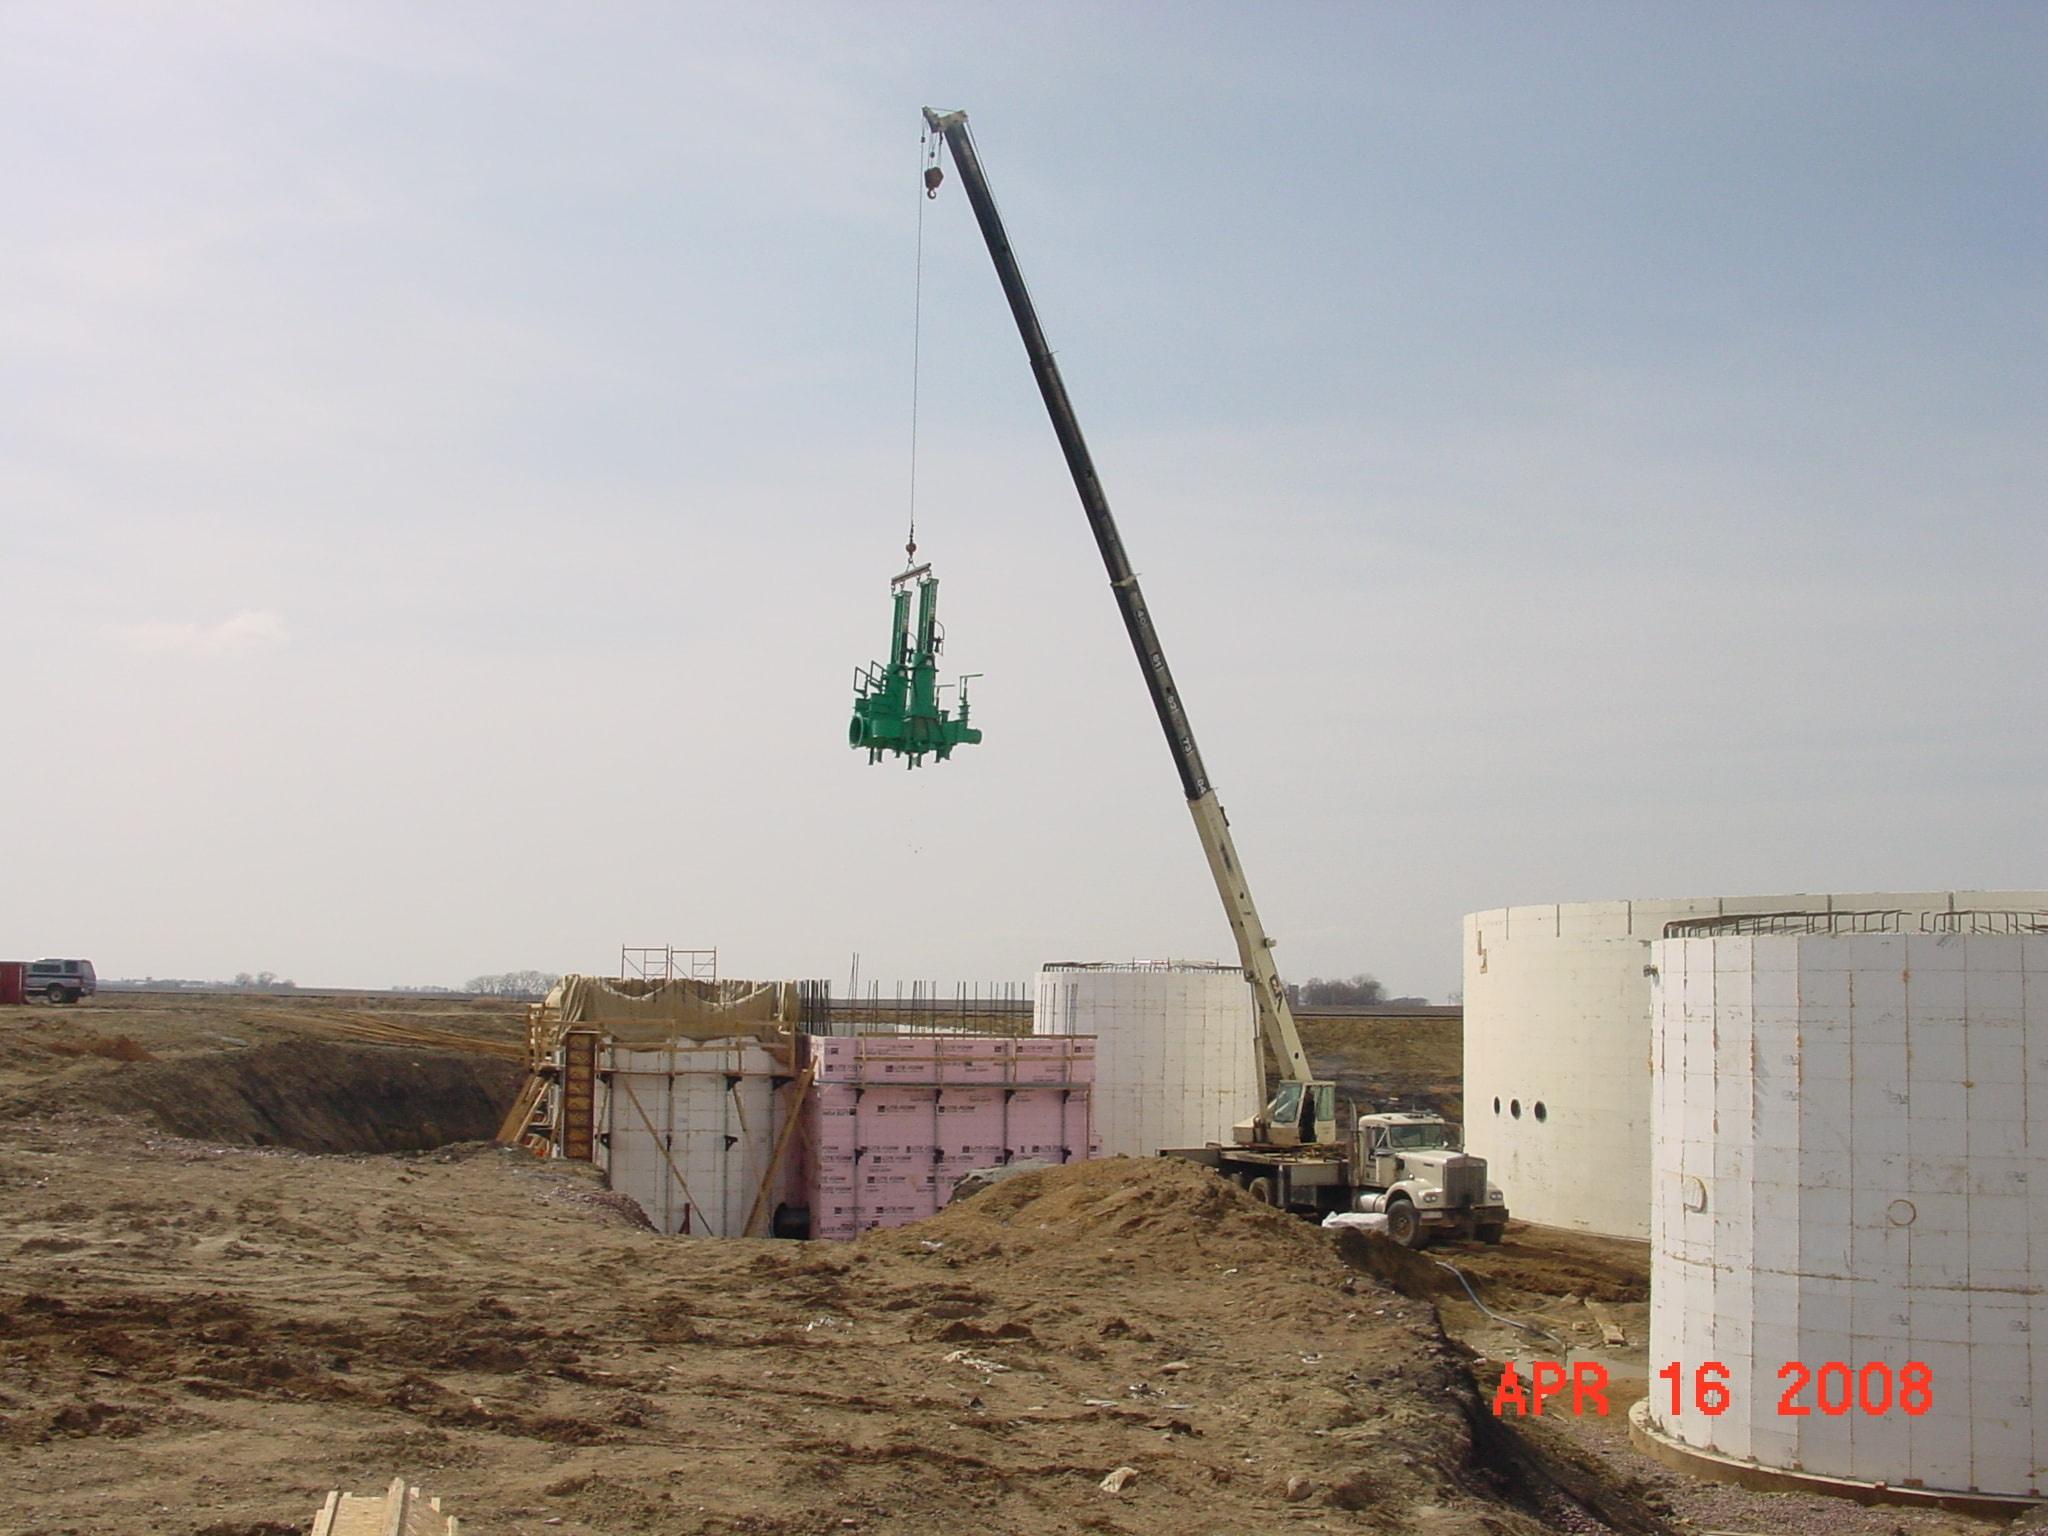 Crane Lifting New Equipment